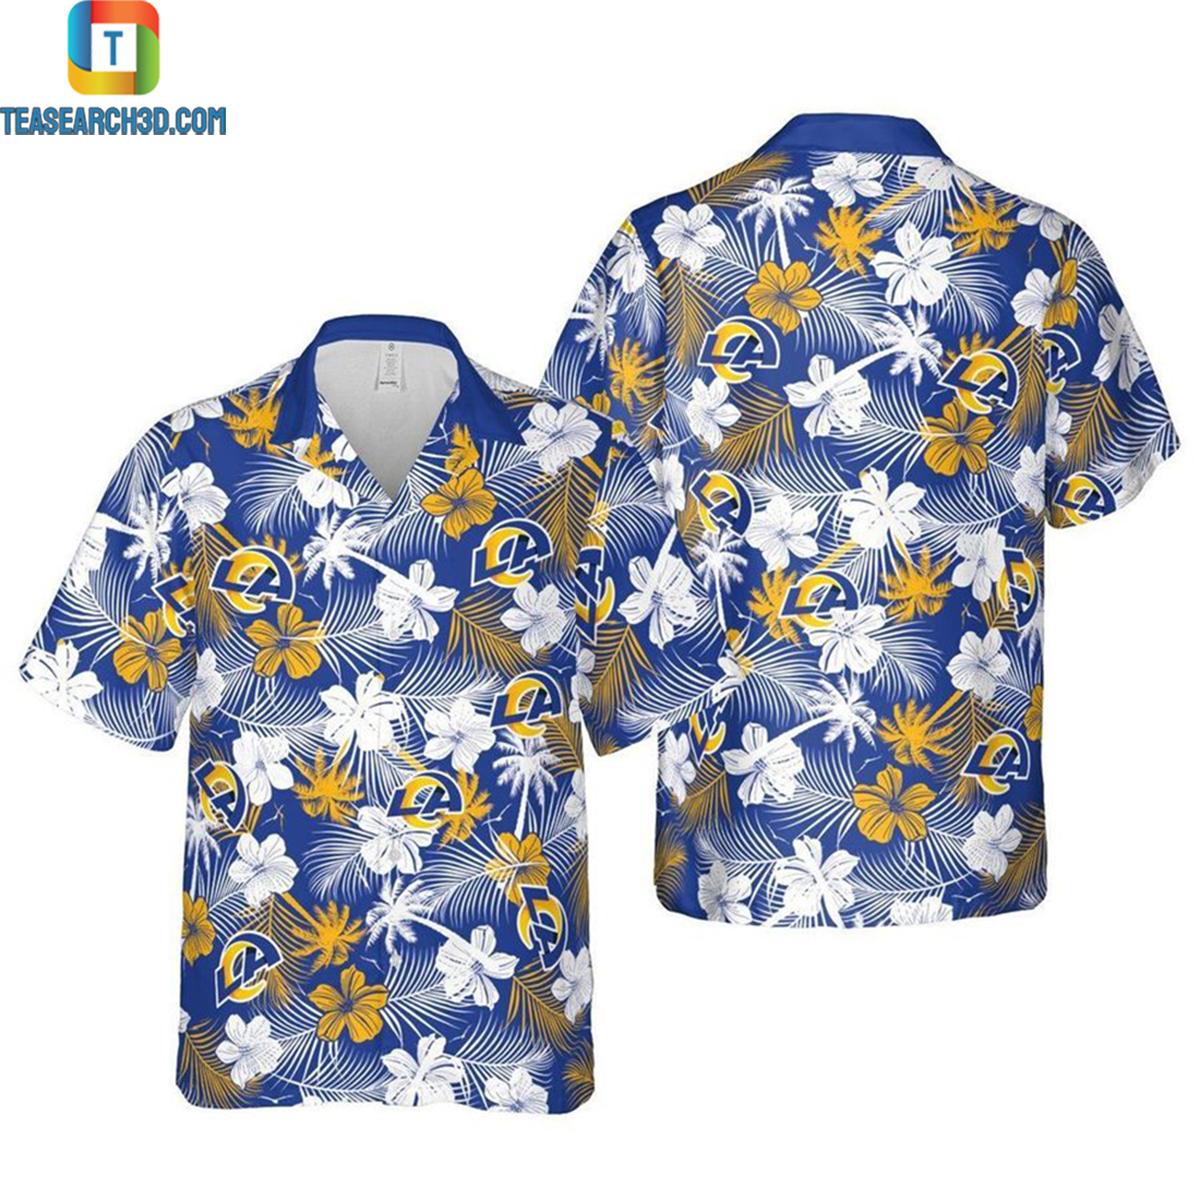 Los angeles chargers floral nfl football hawaiian shirt 2